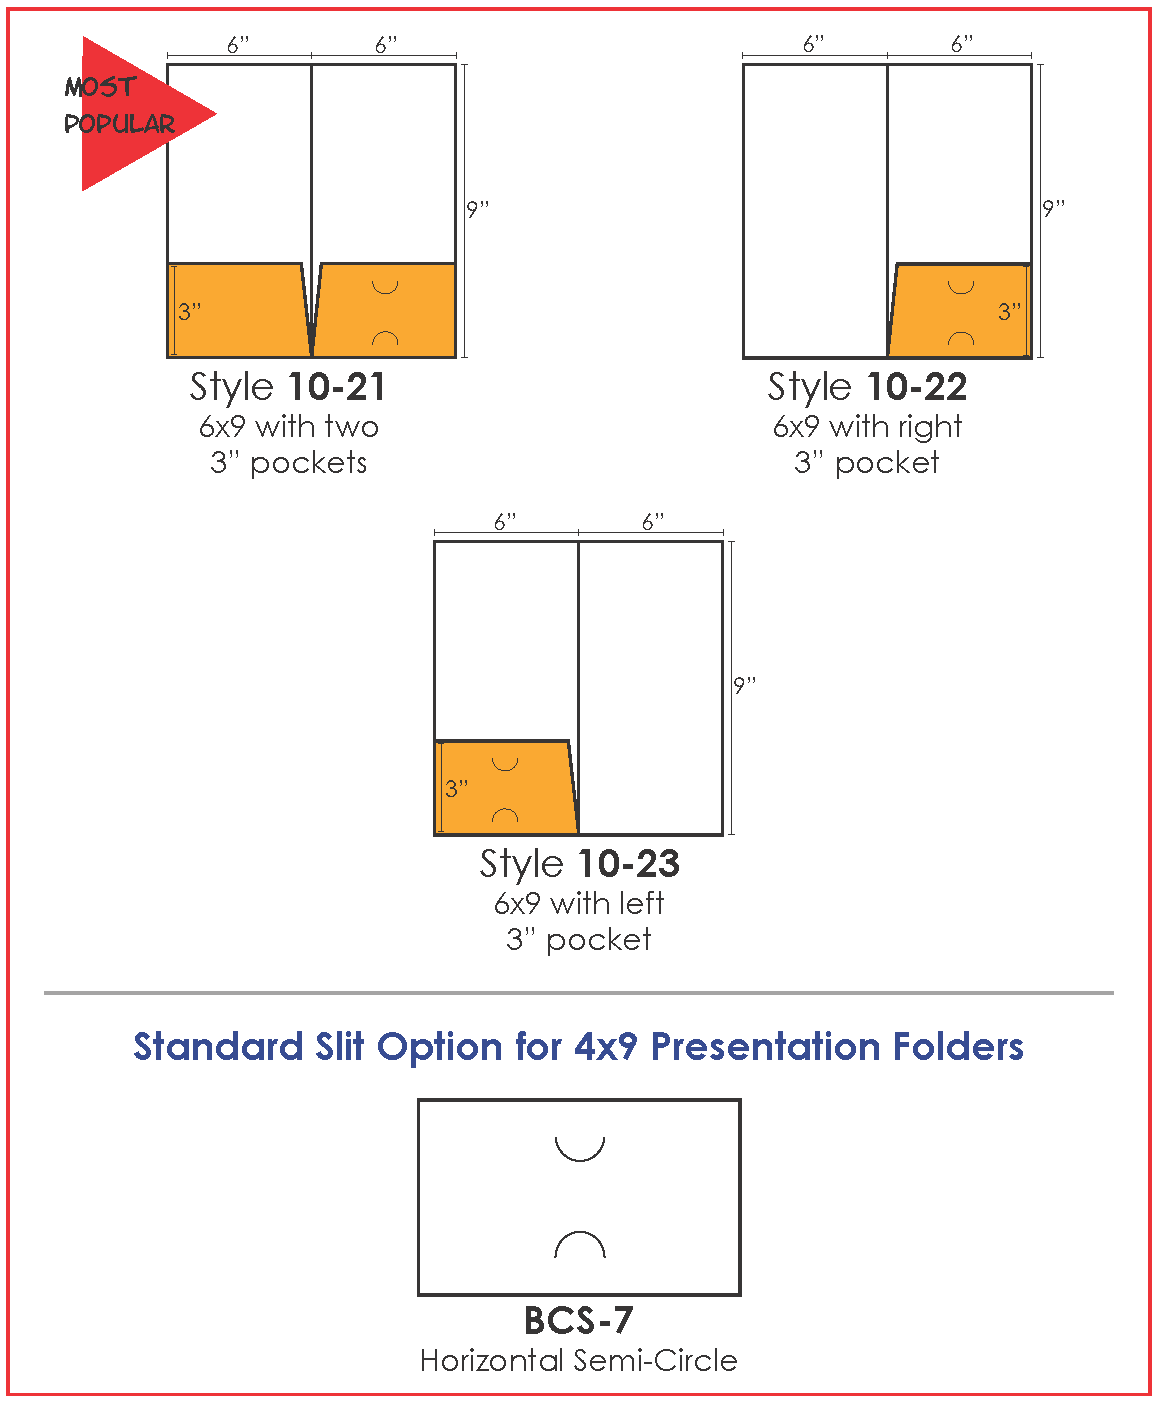 6x9 pocket folder printing in lansing, mi | allegra, Presentation templates